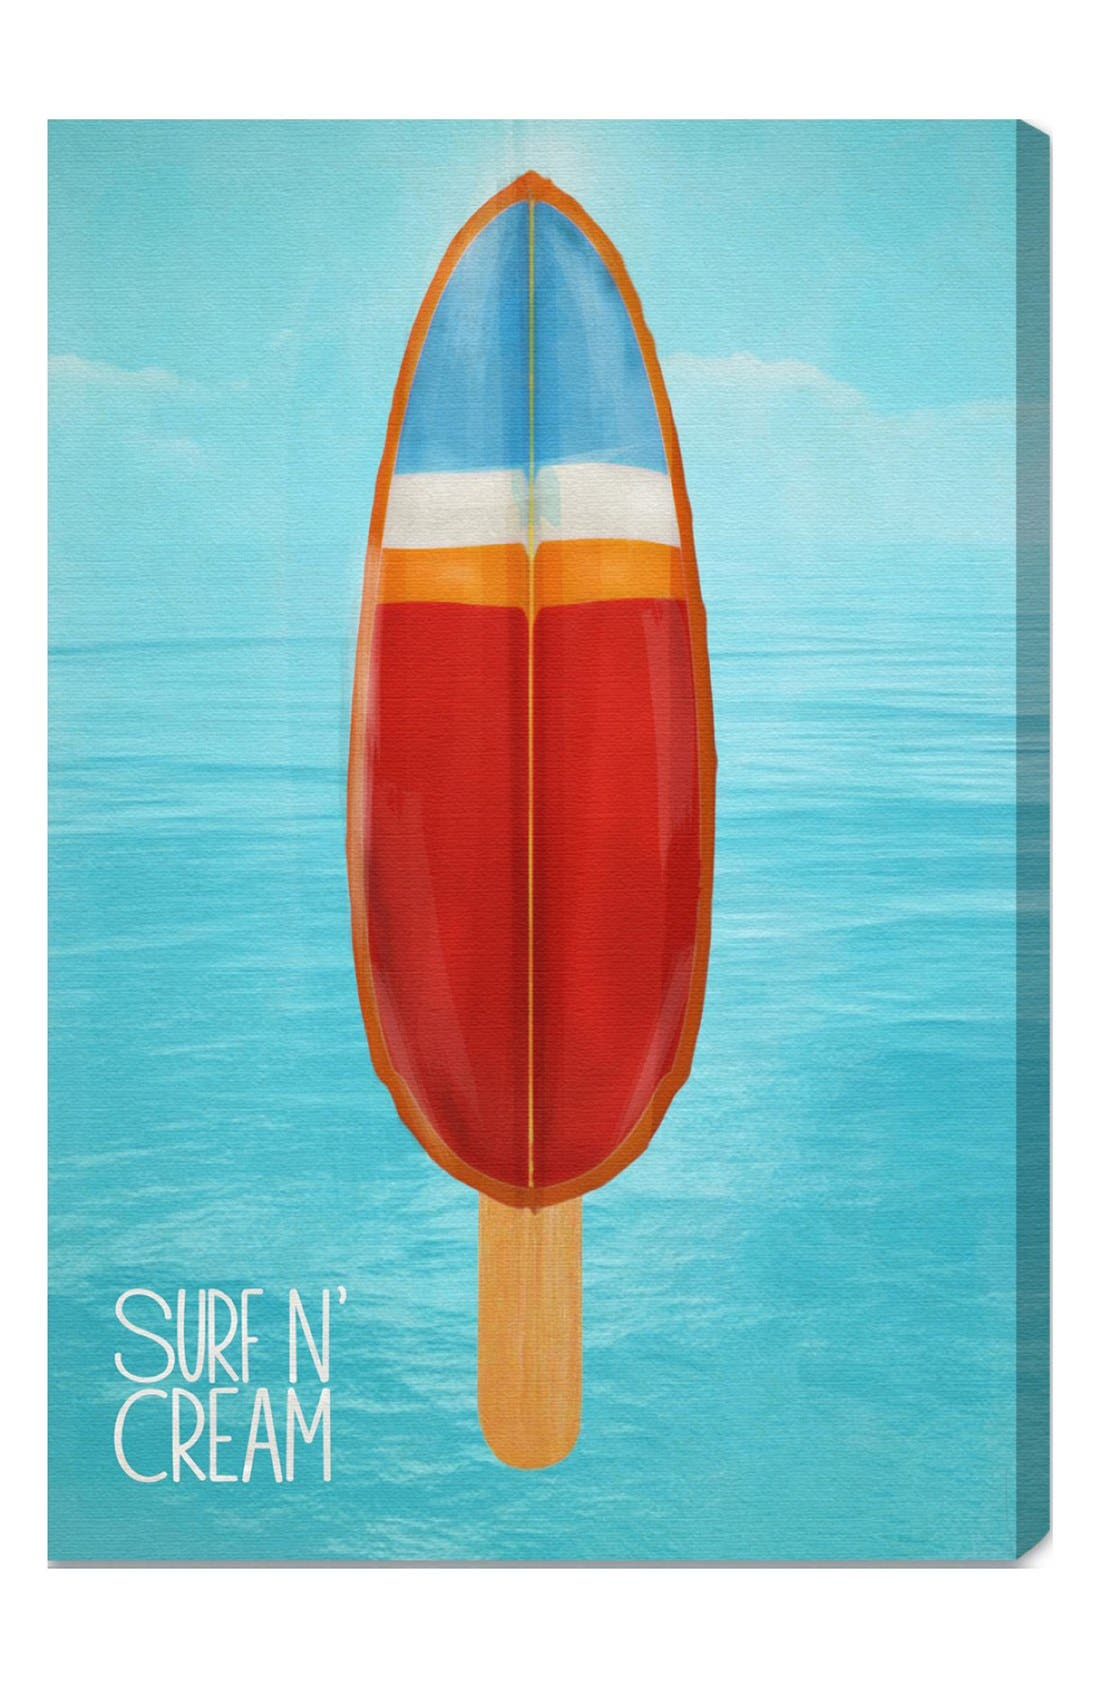 Main Image - Oliver Gal 'Surf 'n Cream' Wall Art